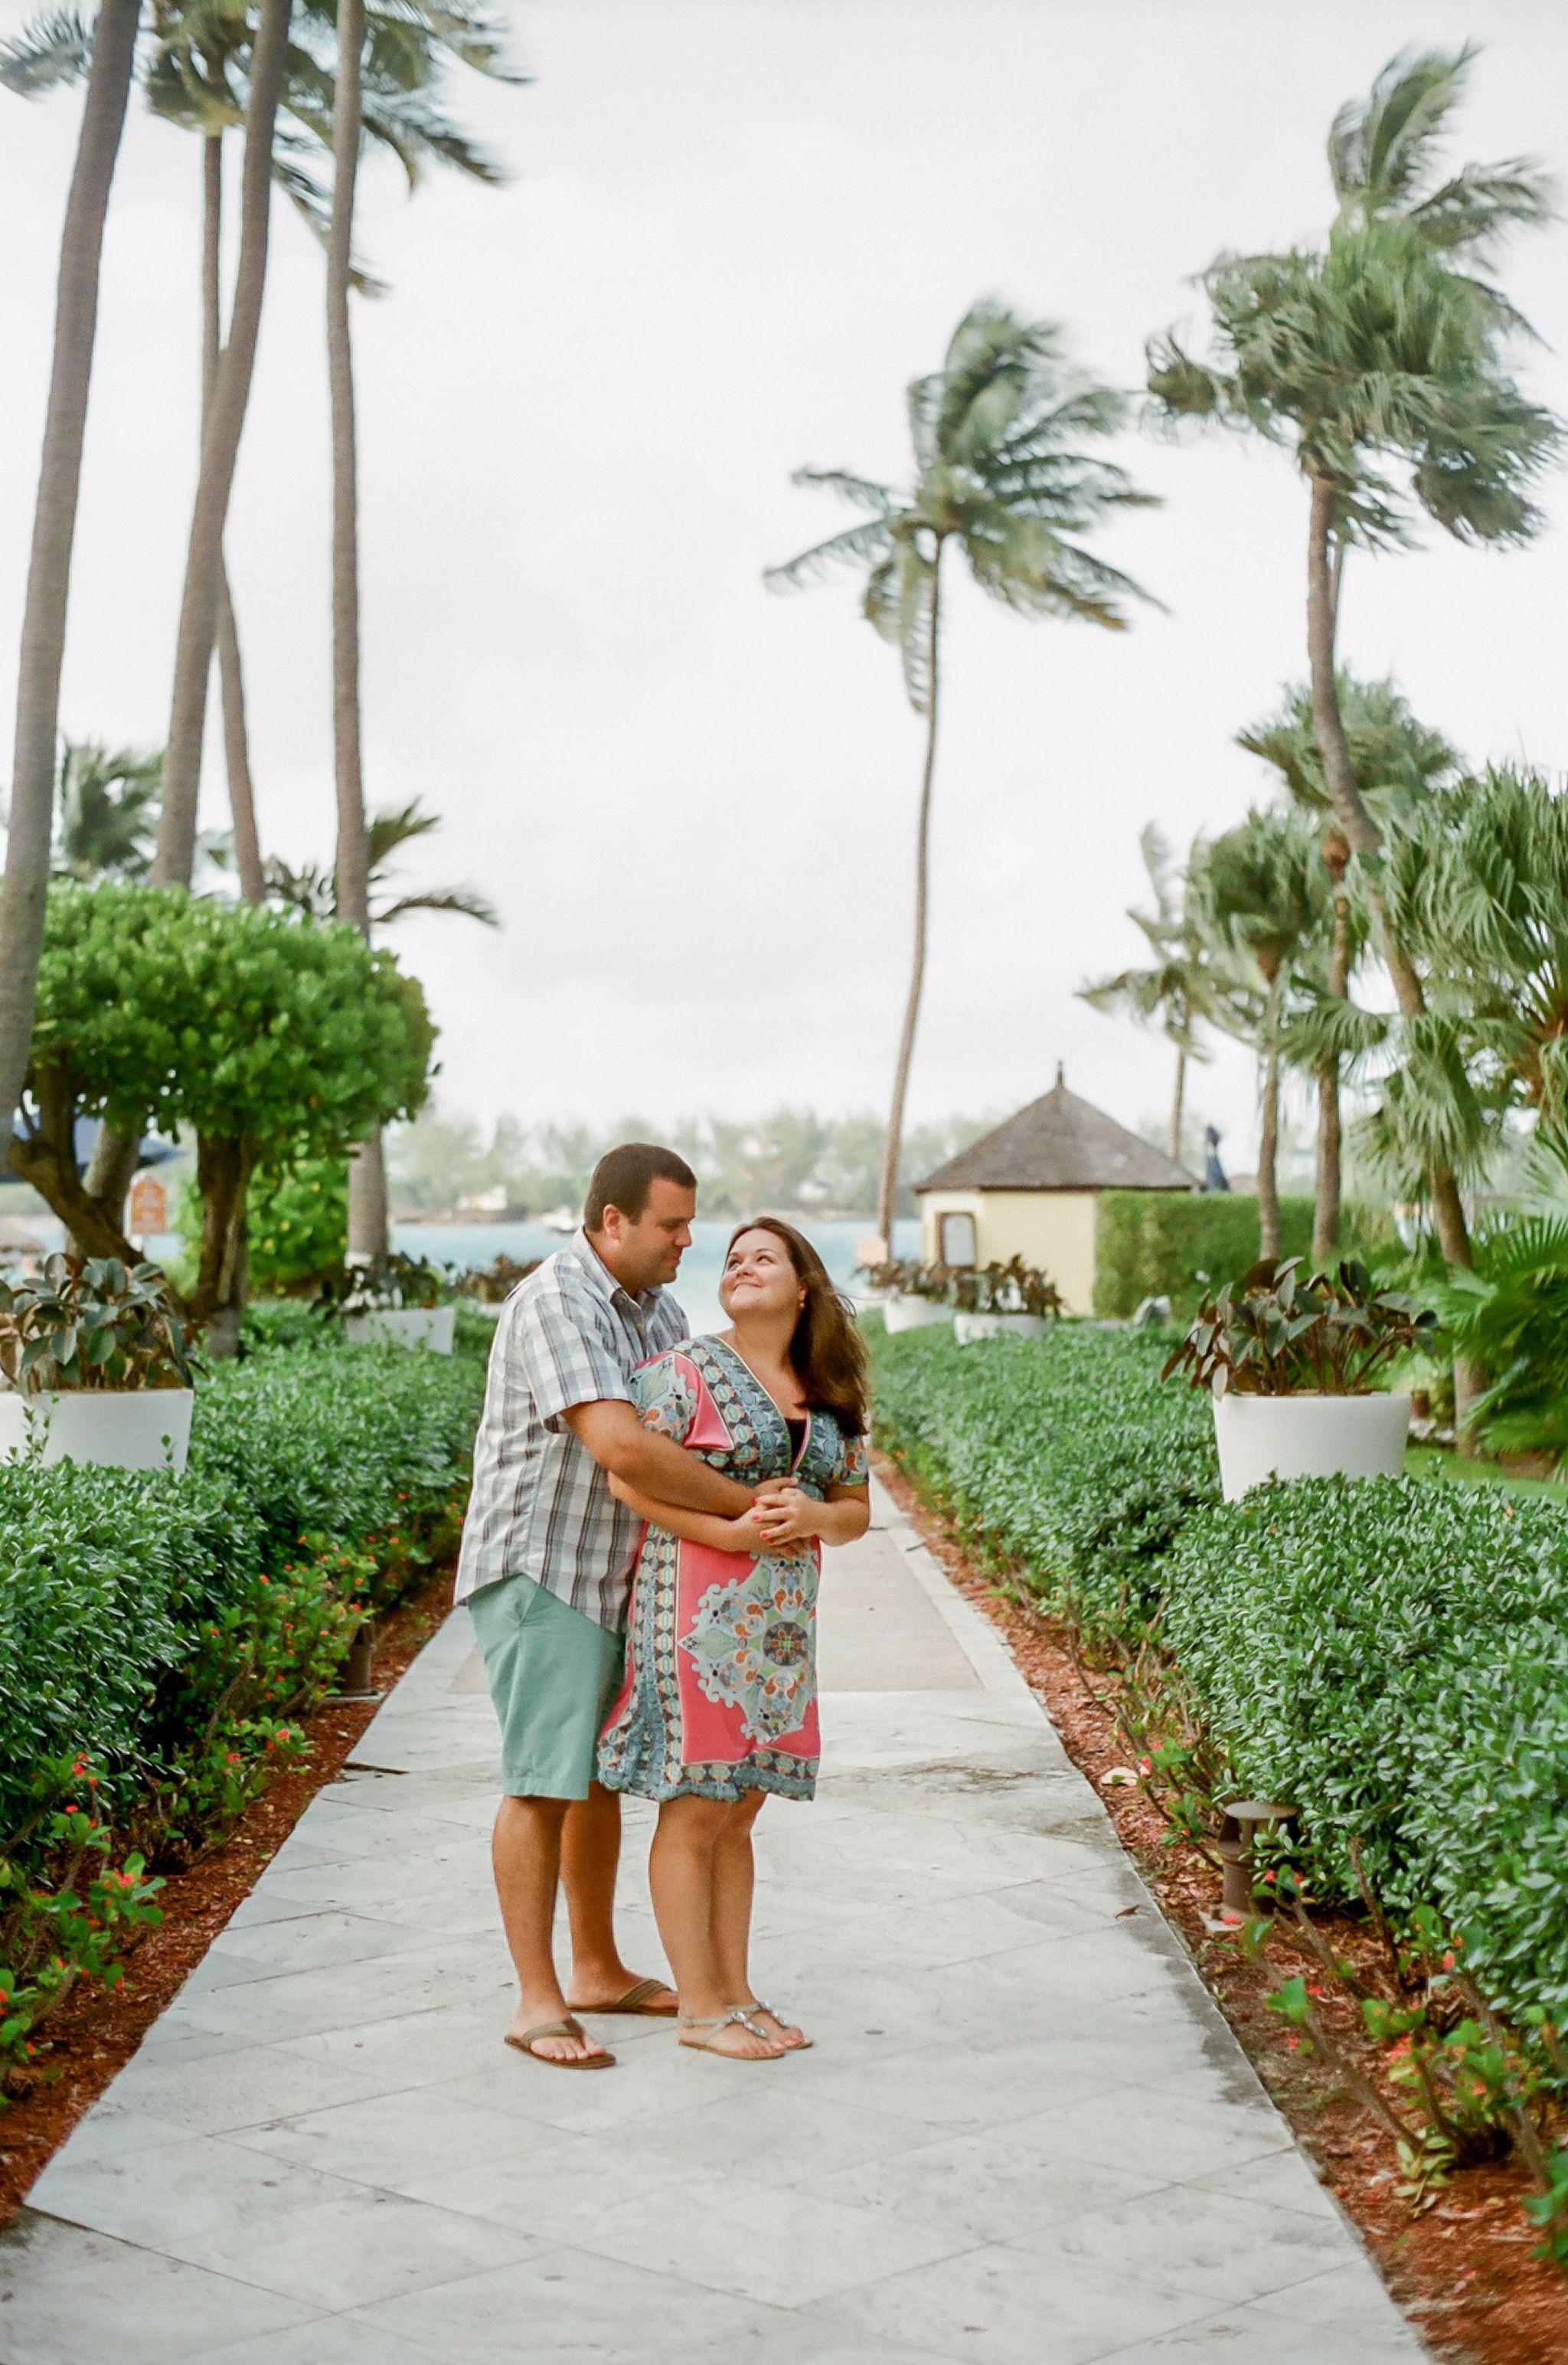 nassau wedding photographer destination wedding photographer hilton bahamas